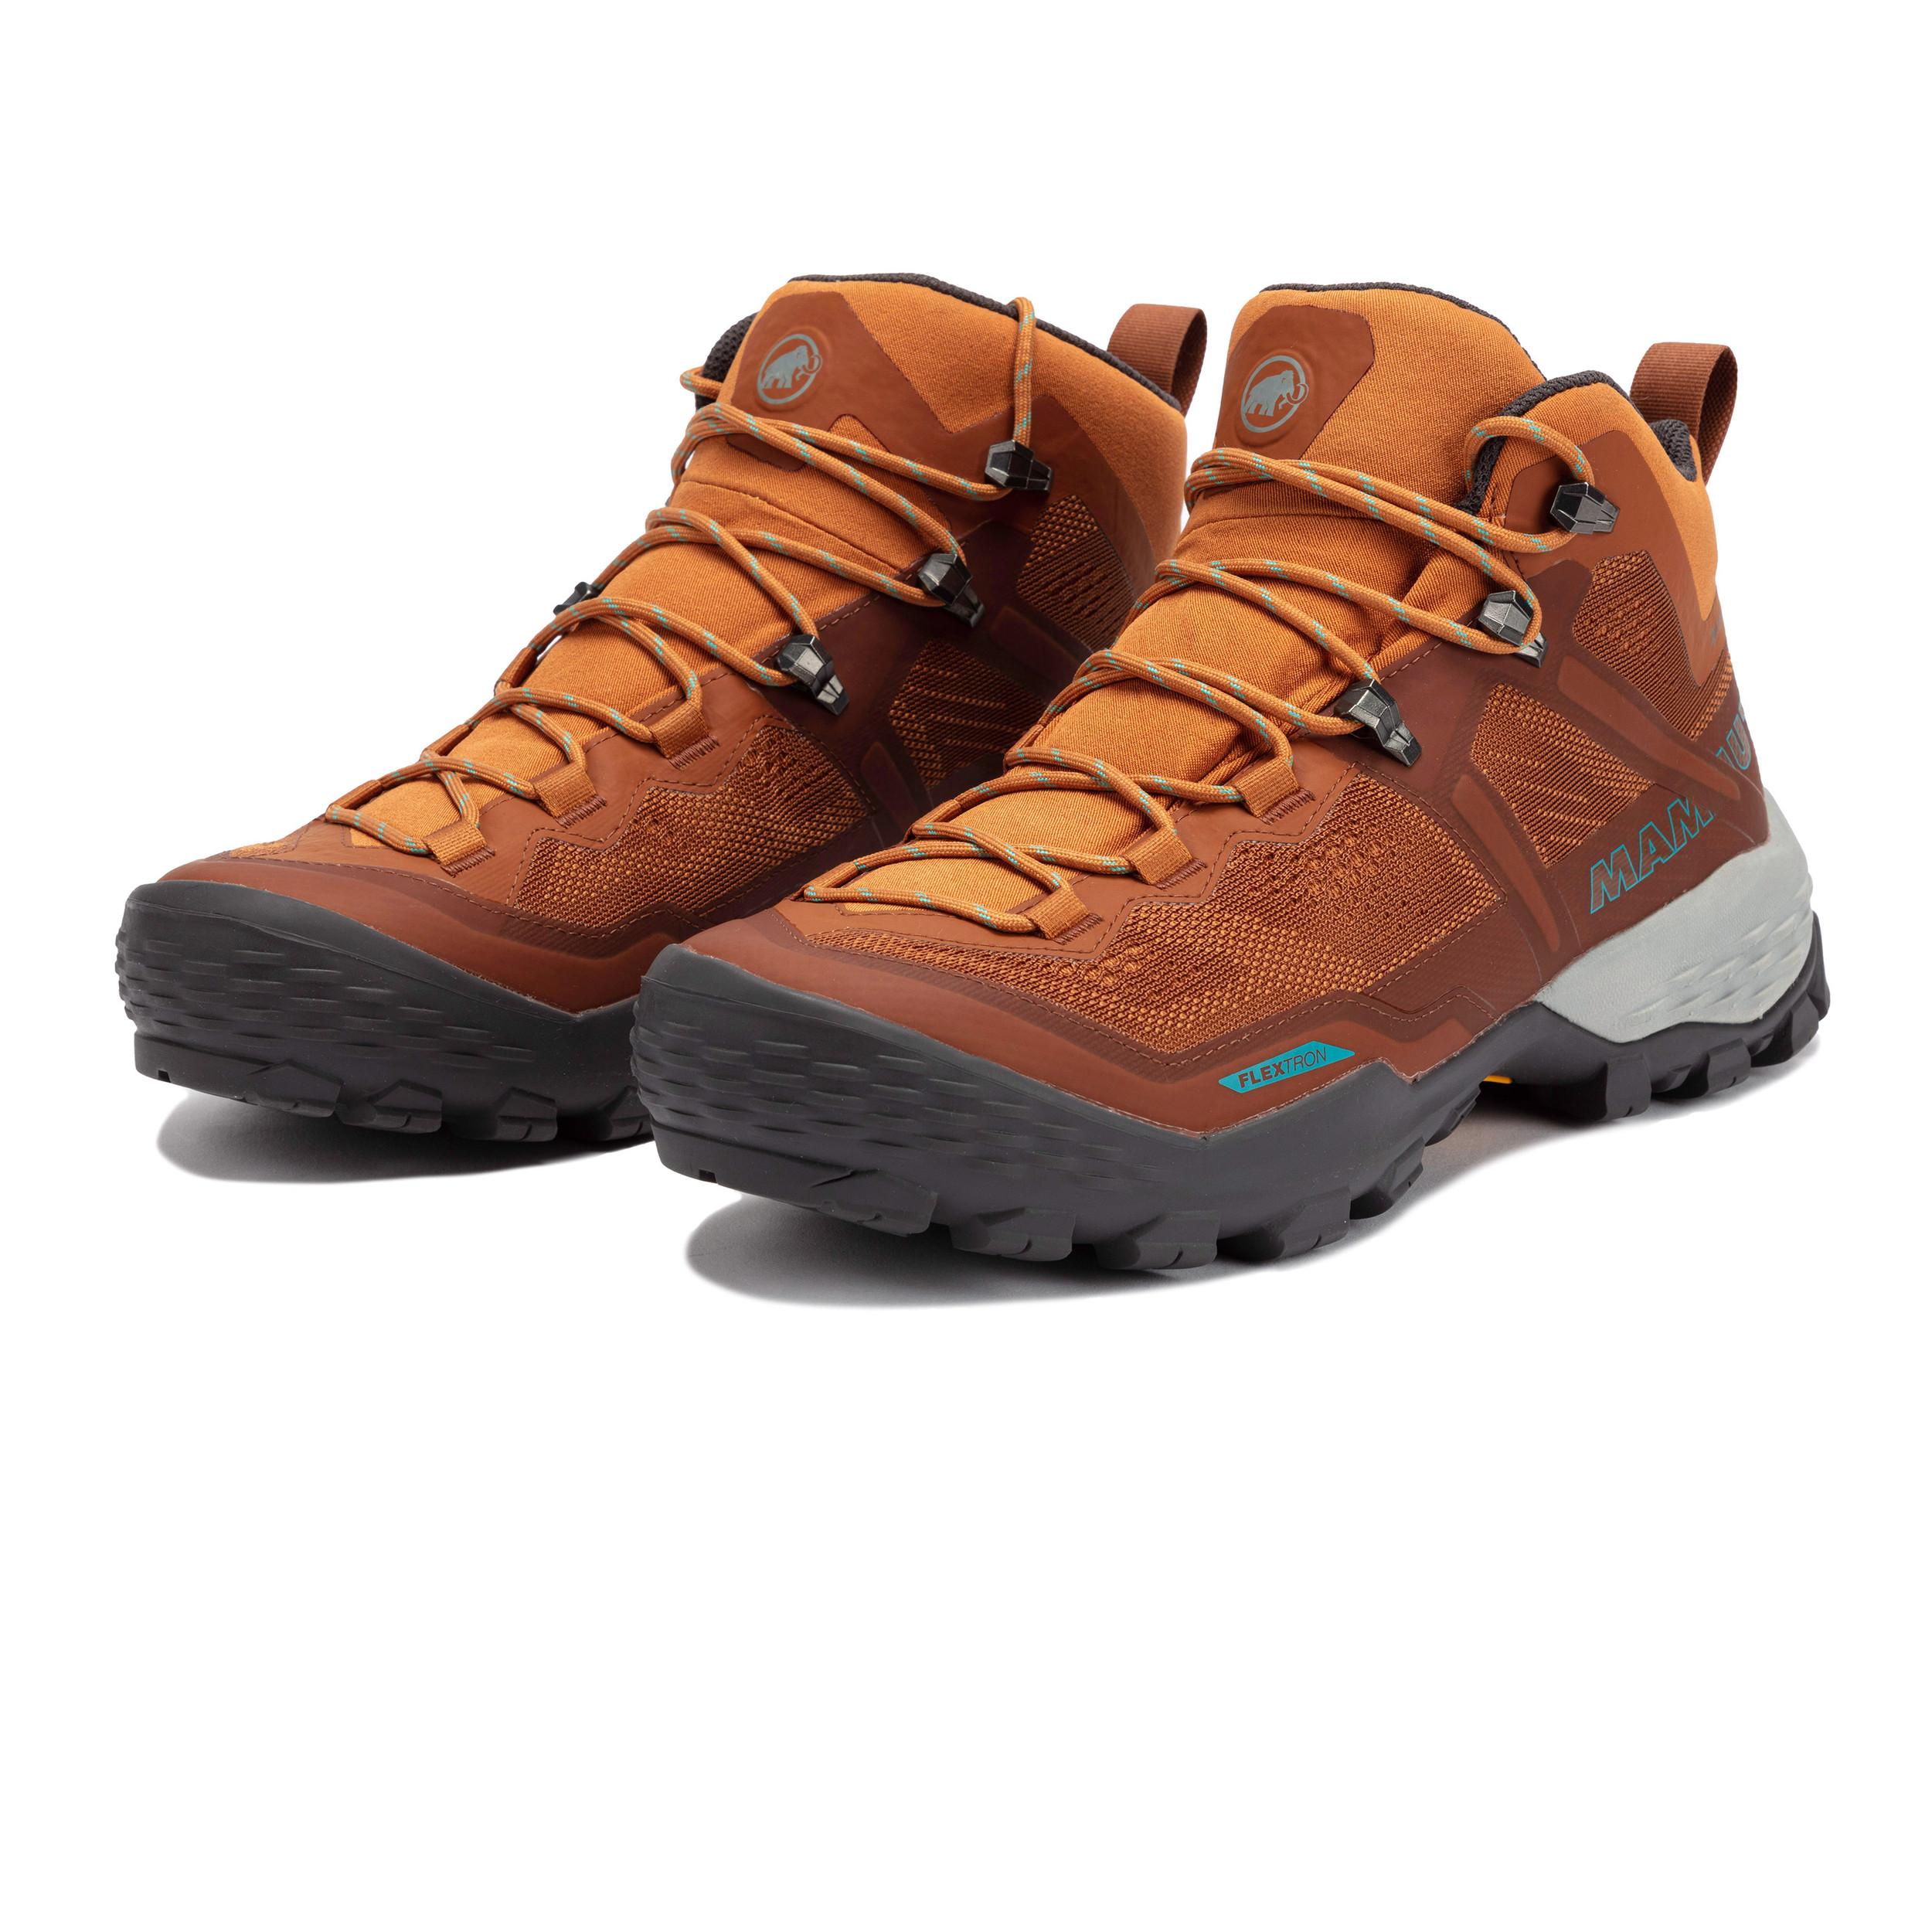 Mammut Ducan Mid Gore-Tex Women's Walking Boots - Ss21